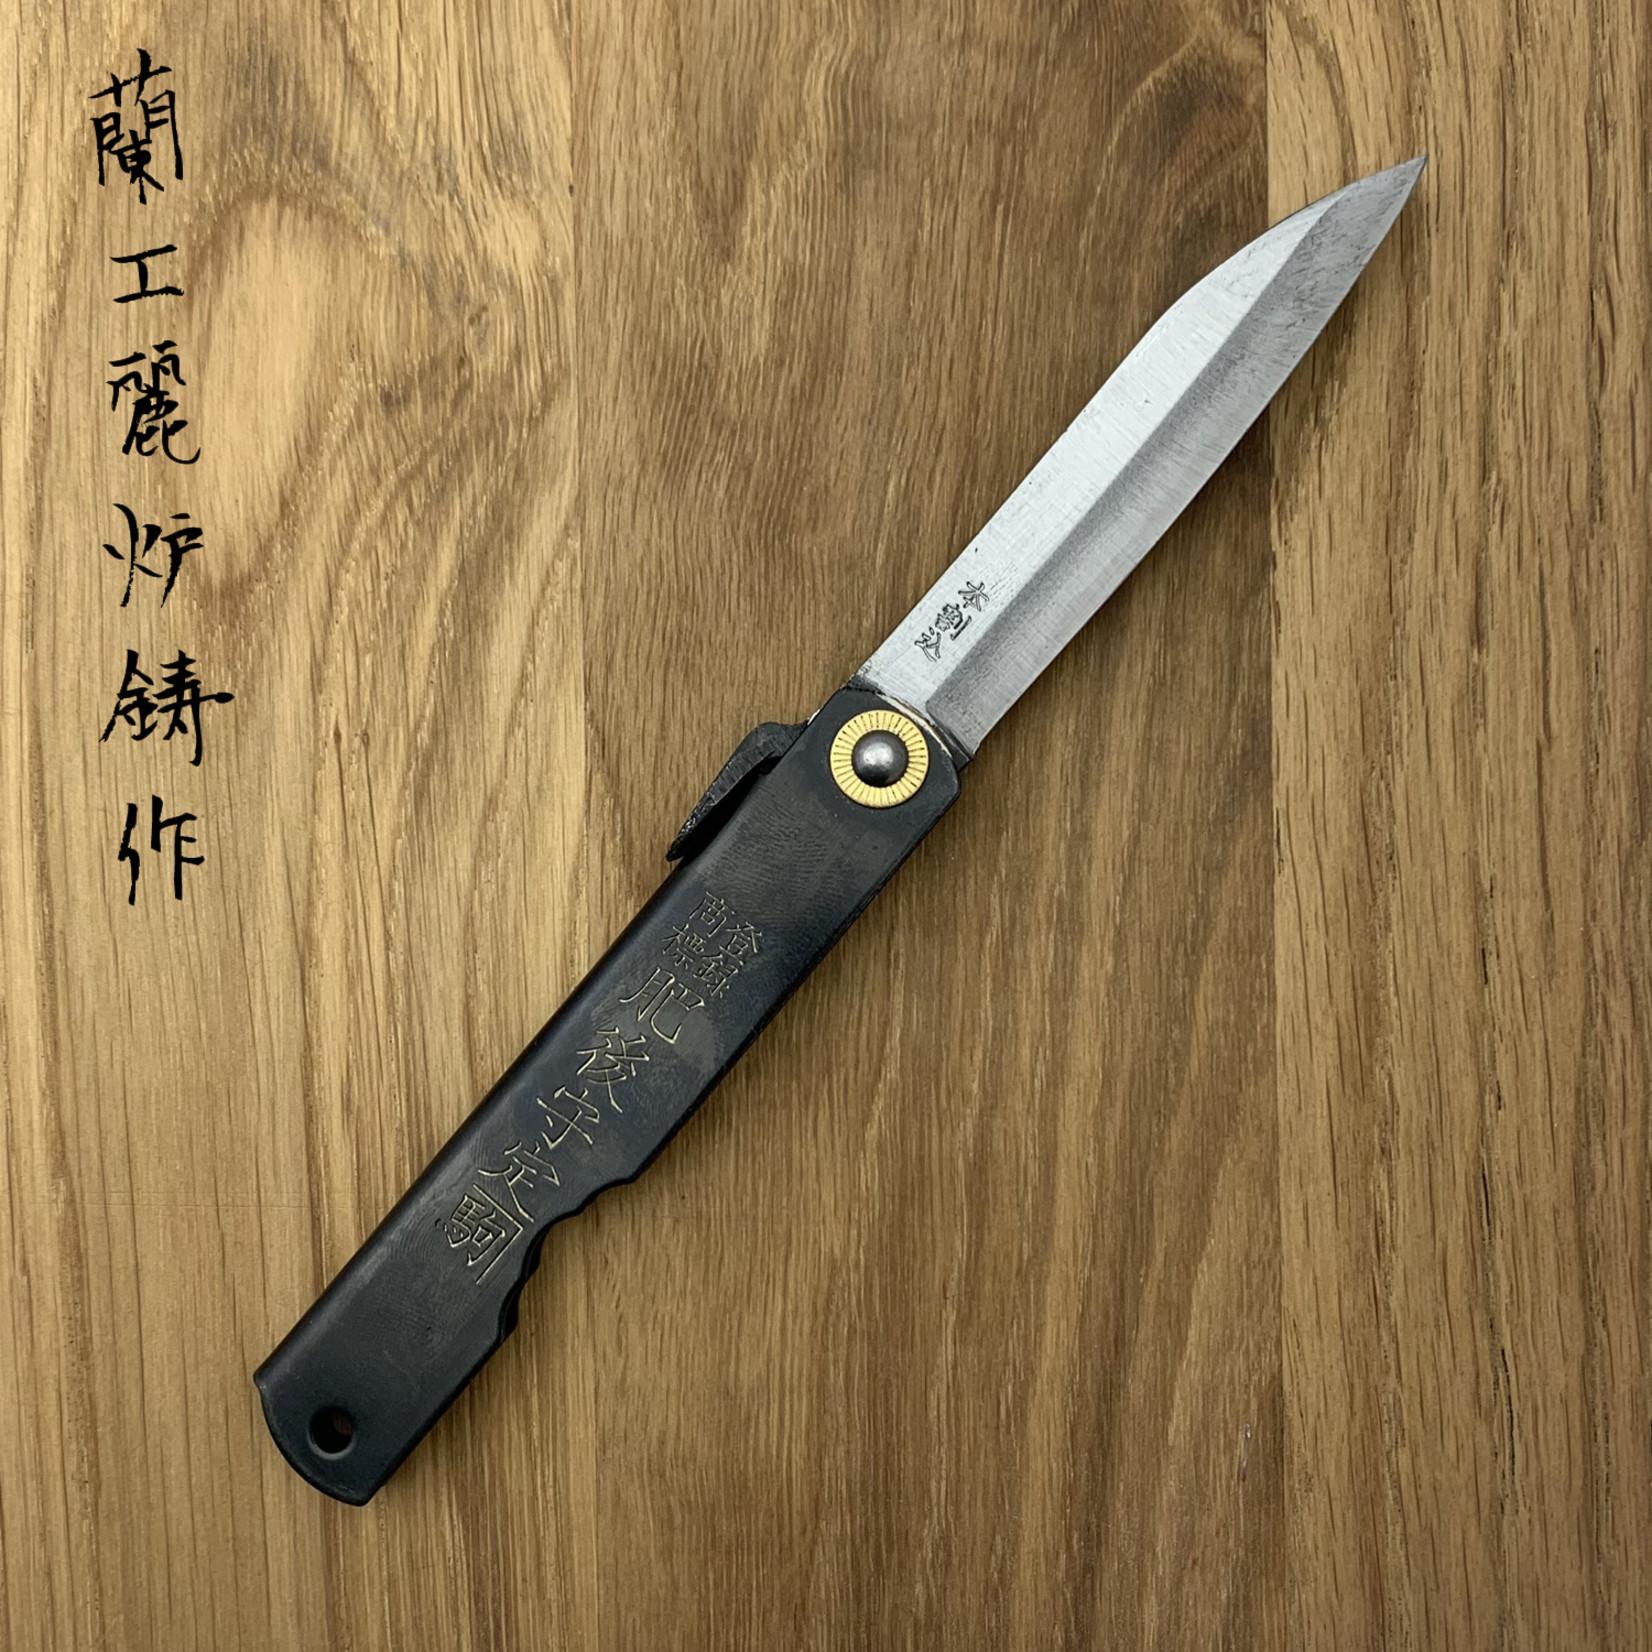 Higonokami Sasaba-Gata Blue steen core 70 mm Black 12BK